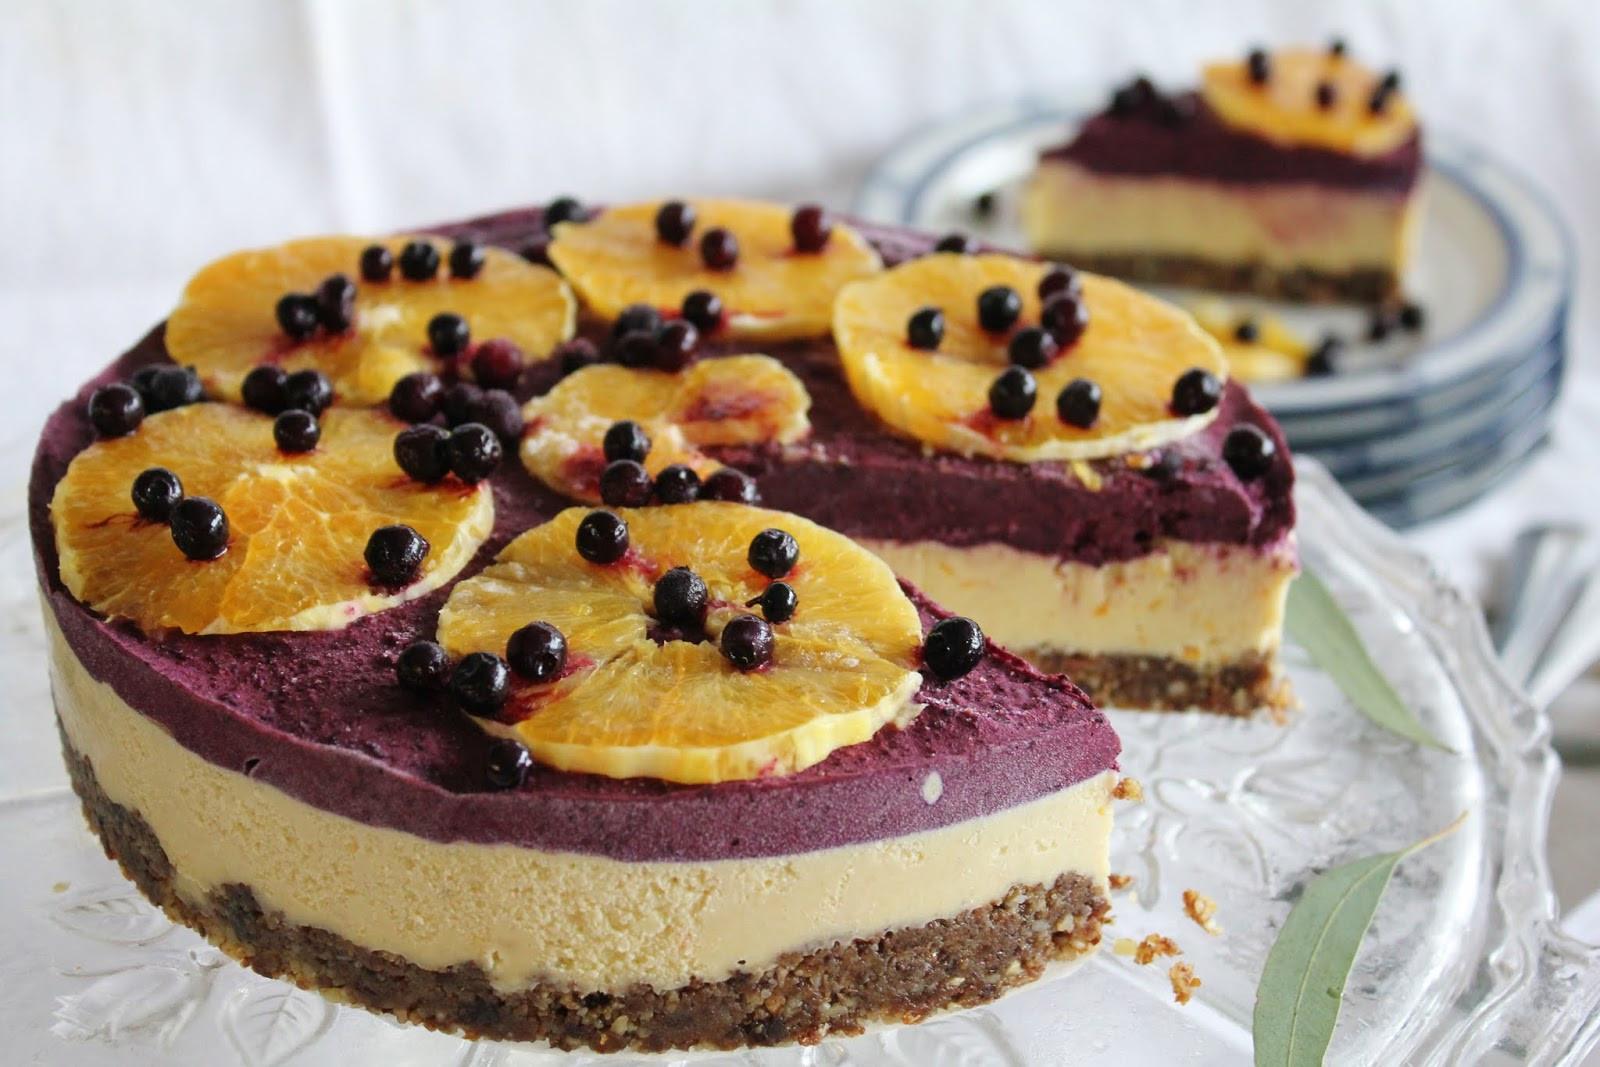 Vegan Recipes Desserts  This Rawsome Vegan Life orange & blueberry cheesecake